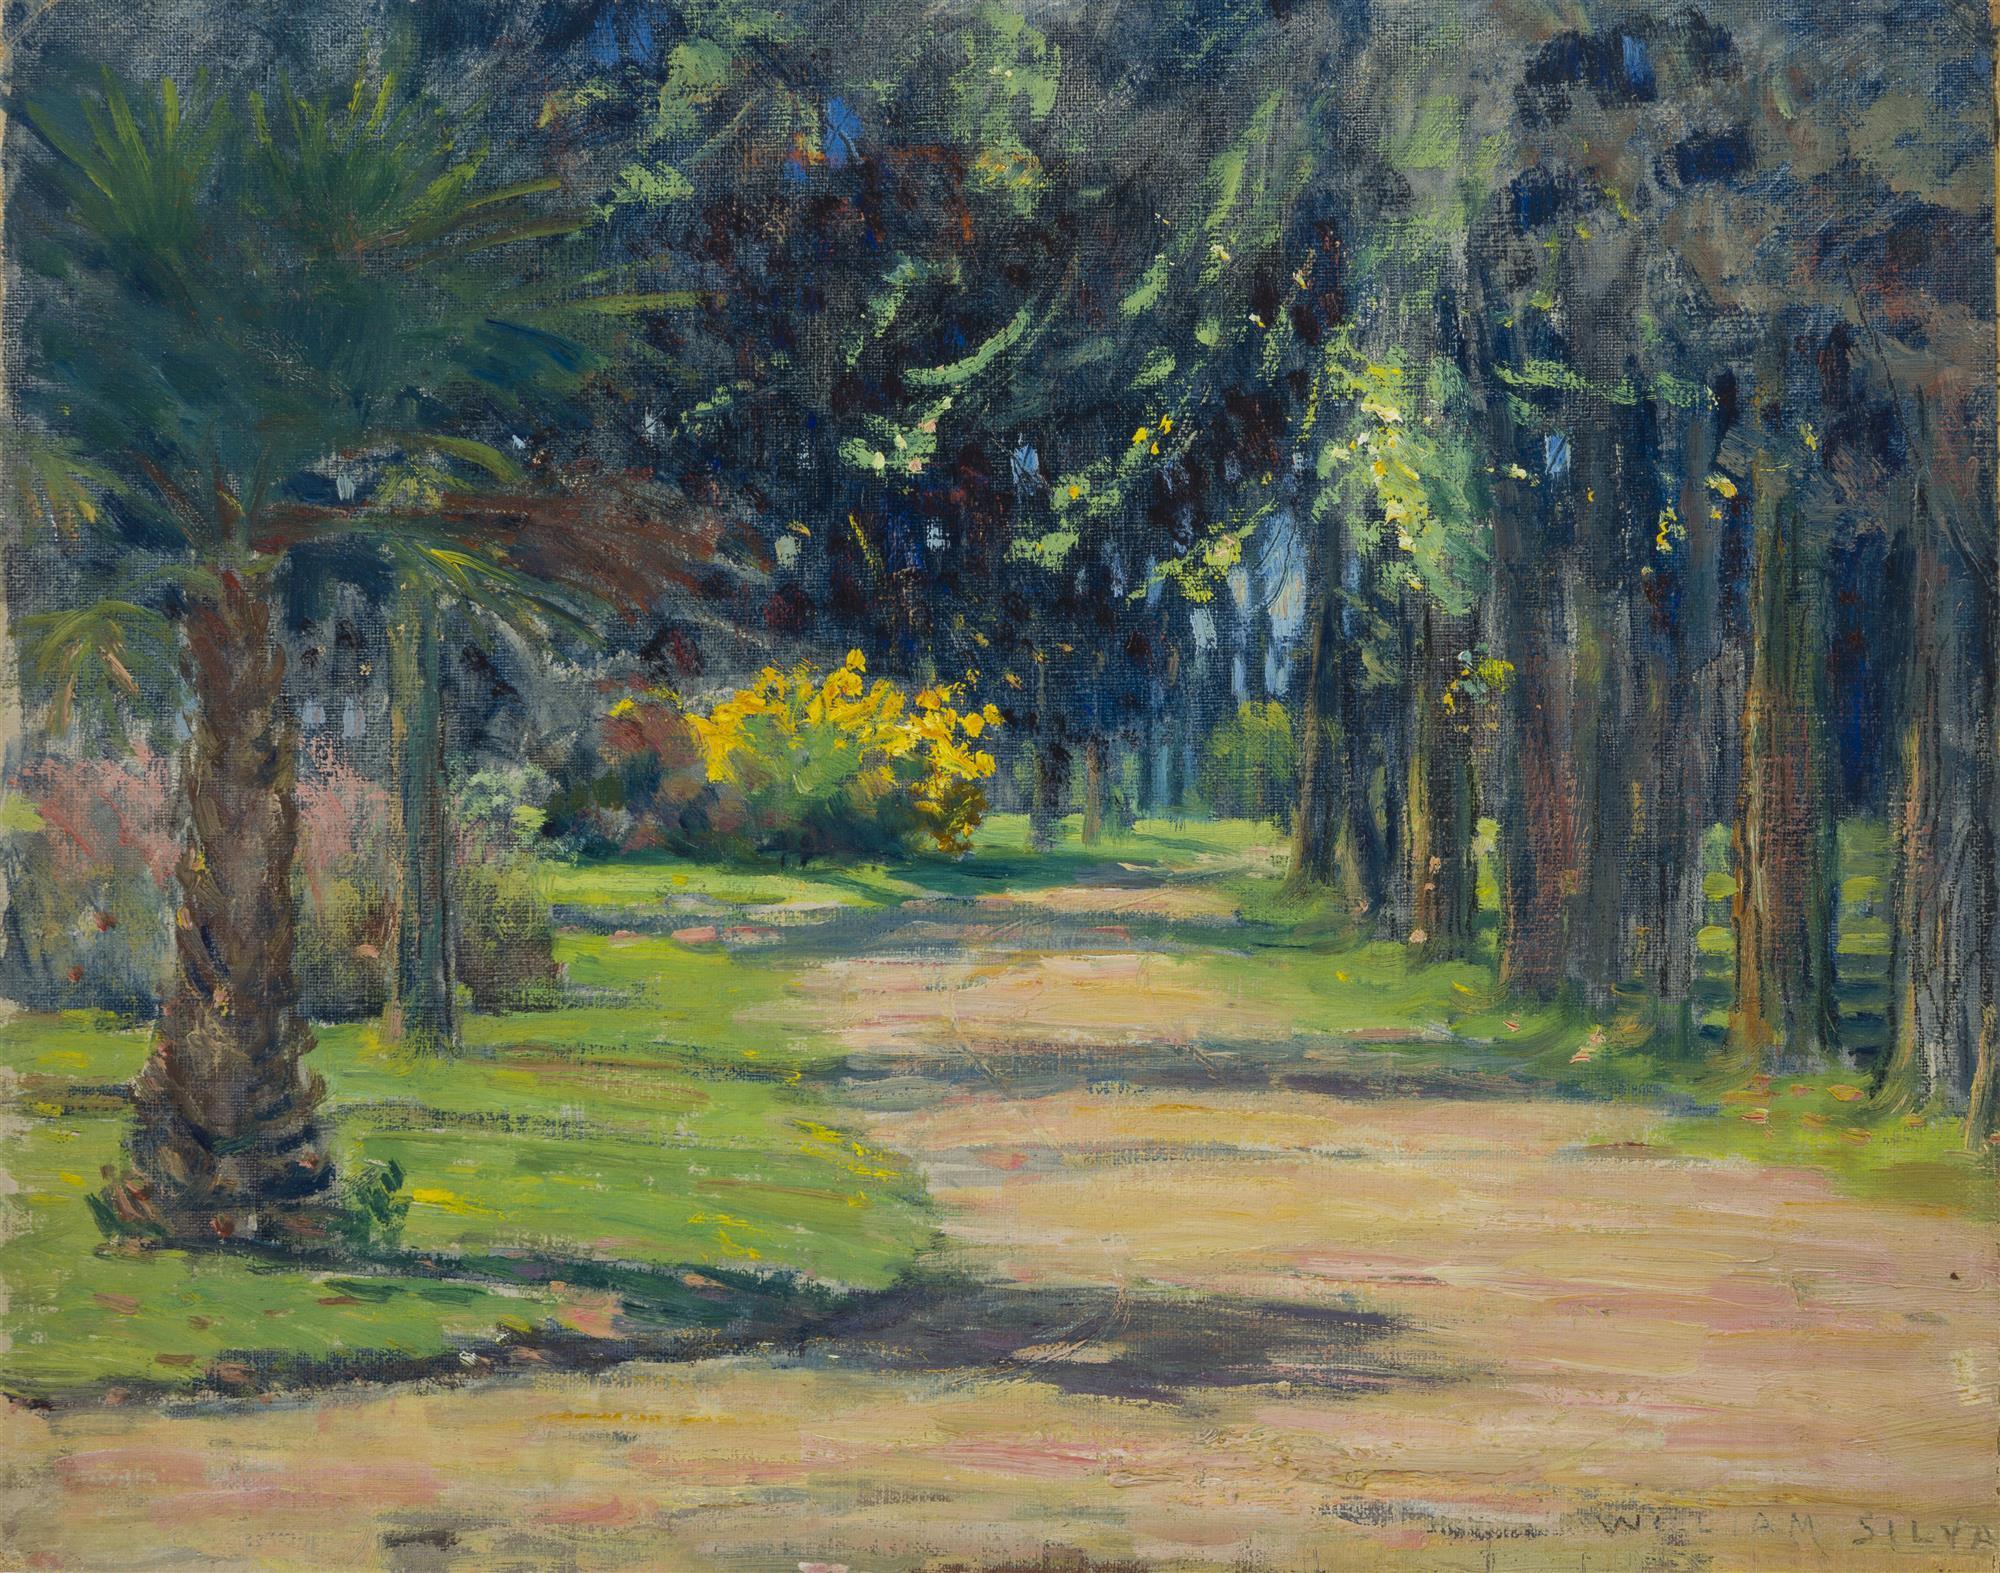 "William Posey Silva, (1859-1948 Carmel, CA), ""Road Thru Park - Sacramento"", Oil on canvasboard, 12"" H x 15"" W"